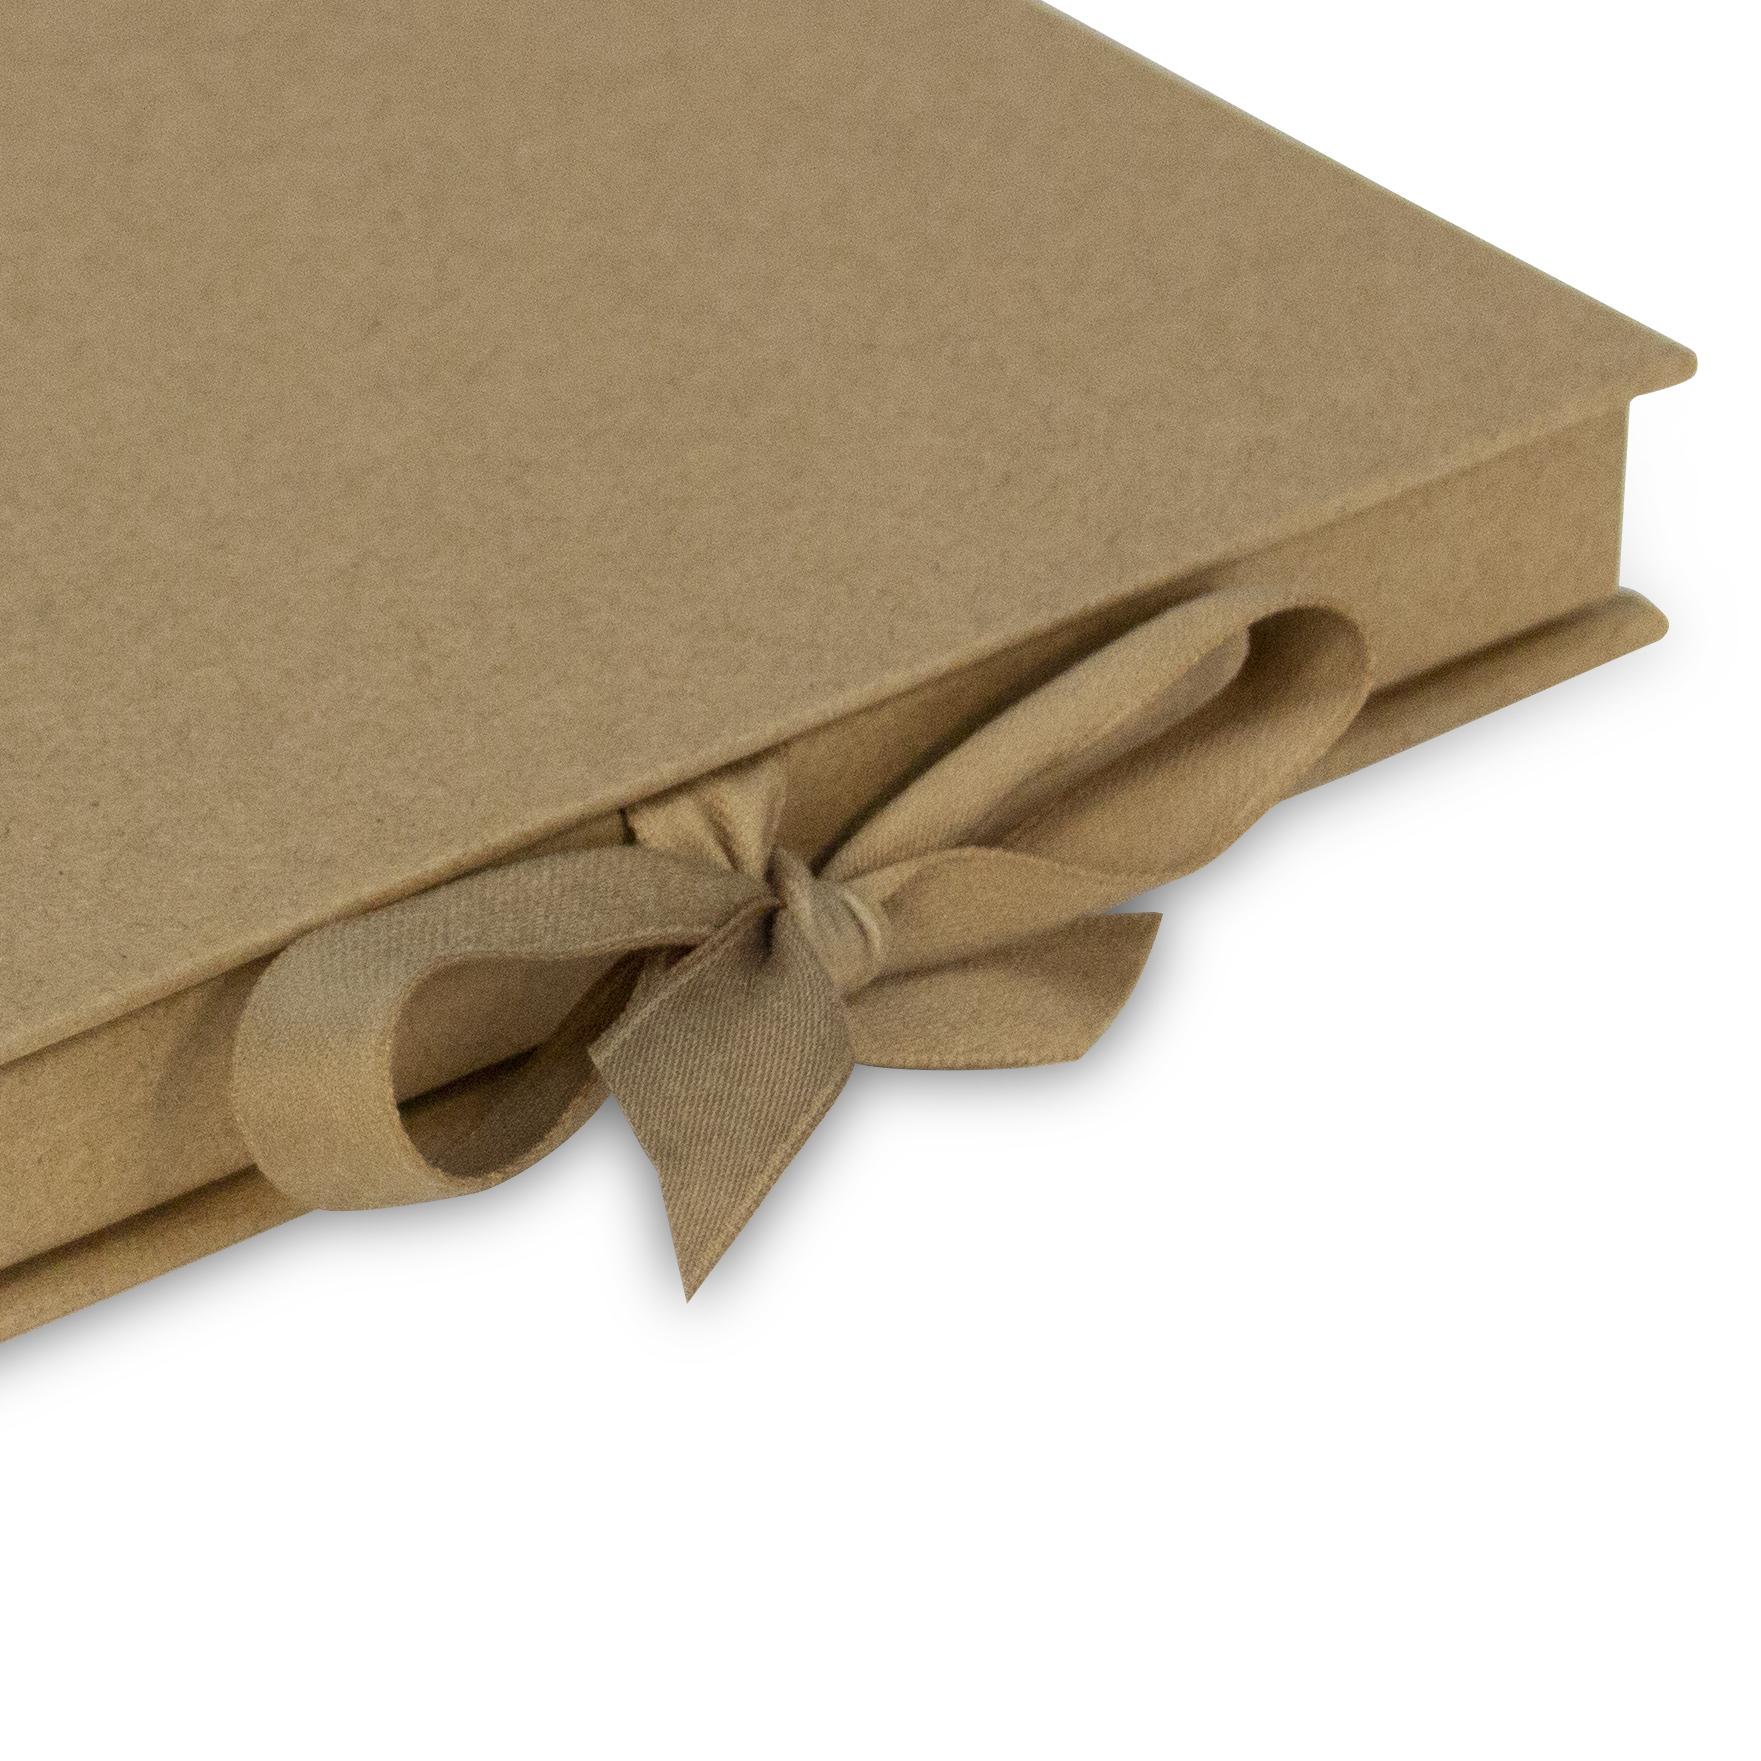 Giftcard doosjes met lintsluiting - Kraft